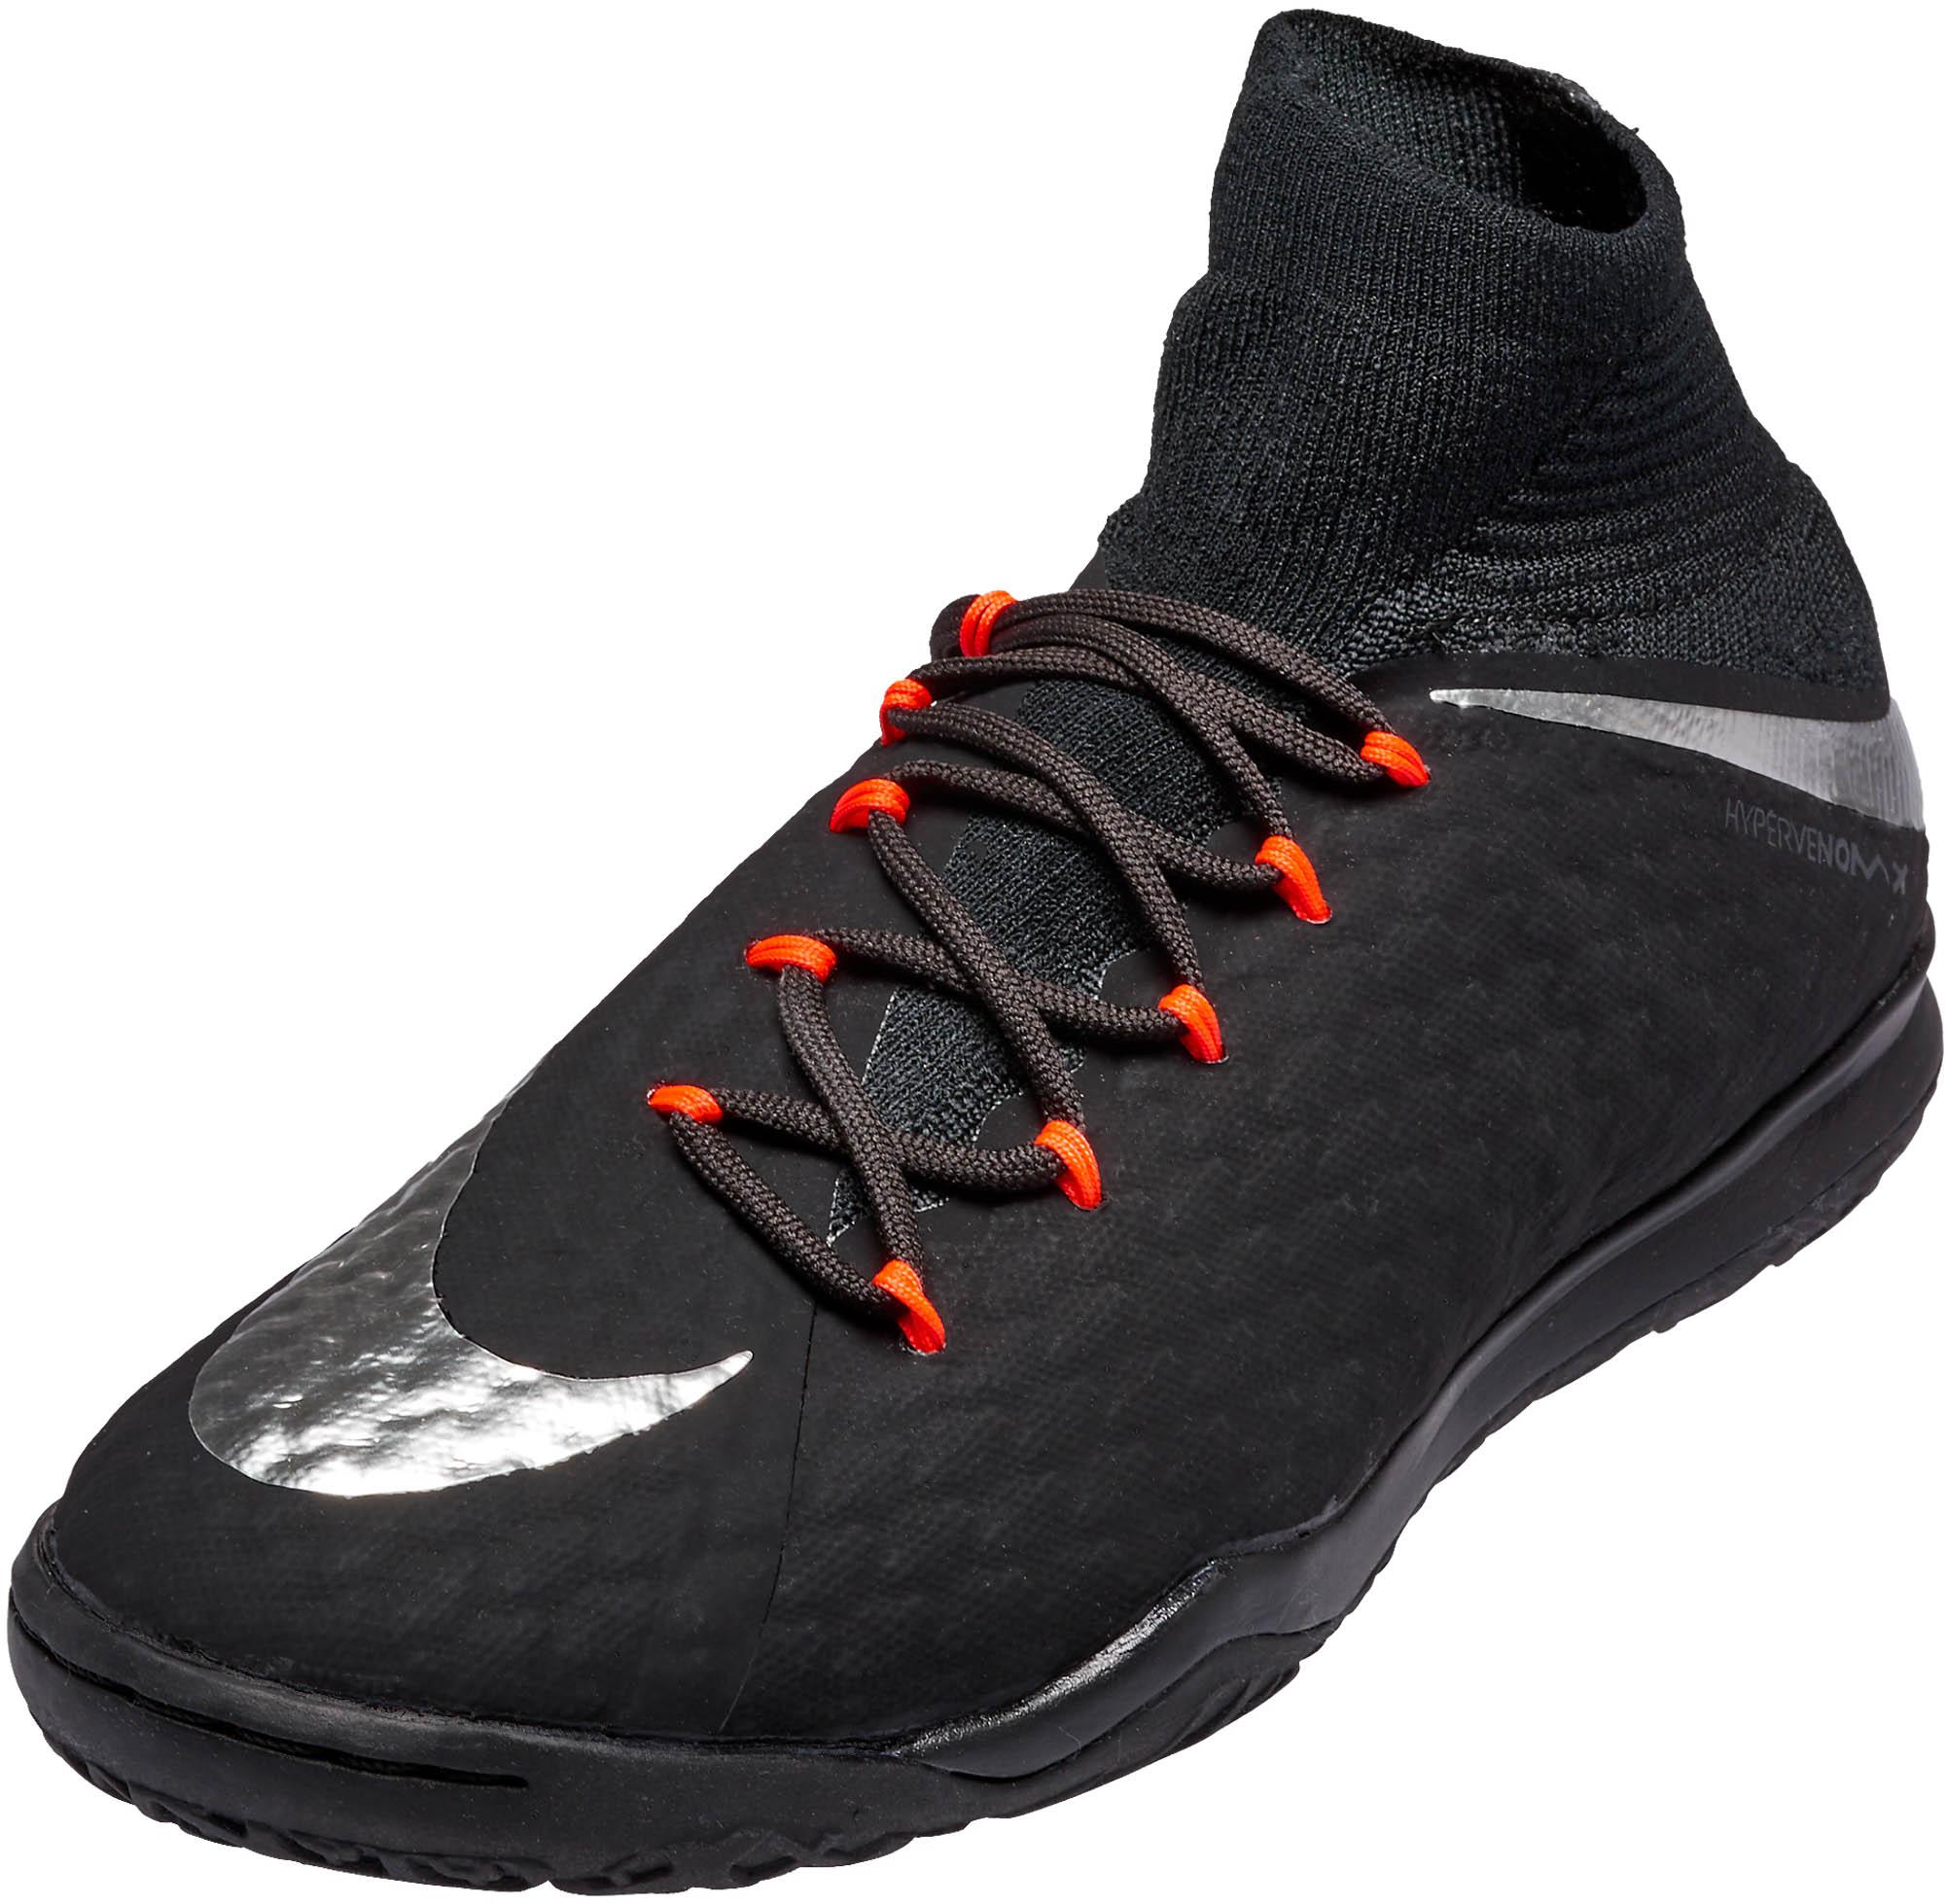 5831eae3f Nike Kids HypervenomX Proximo II IC Soccer Cleats – Black & Anthracite.  CLEARANCE ...